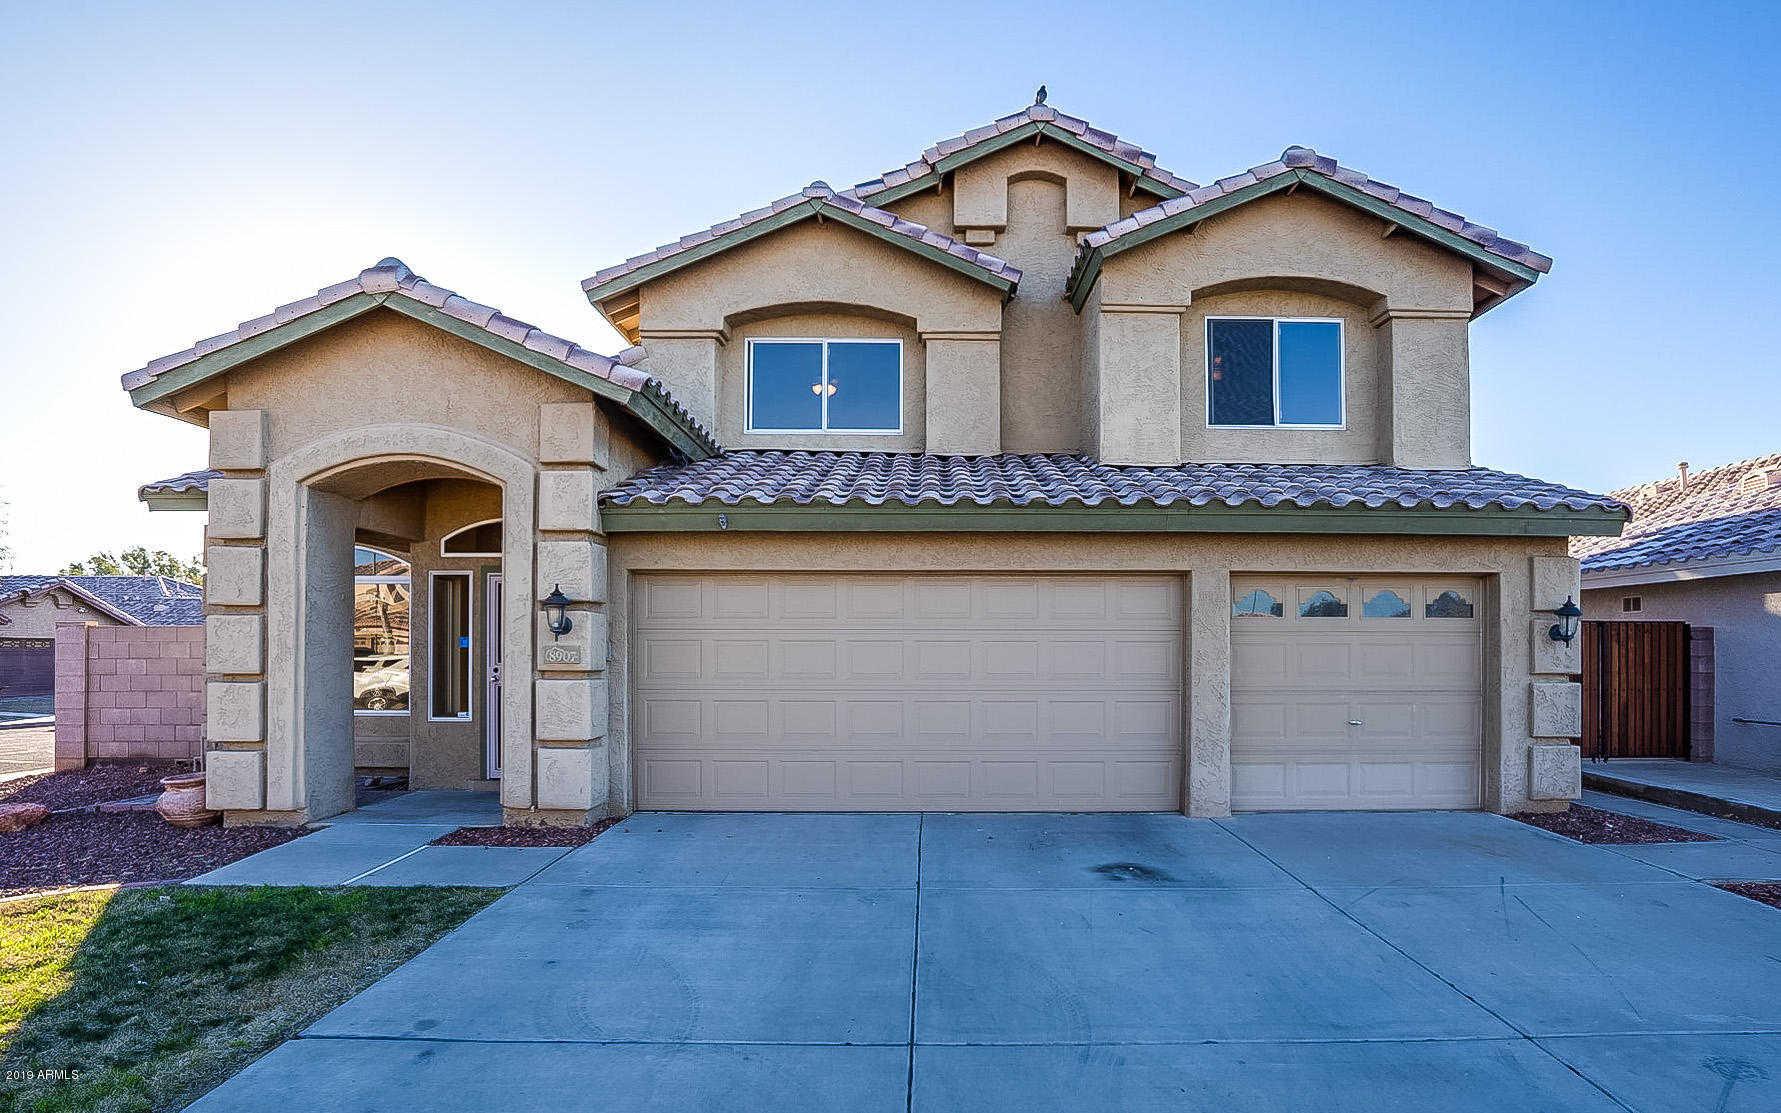 $342,000 - 4Br/3Ba - Home for Sale in Arrowhead Cove, Peoria